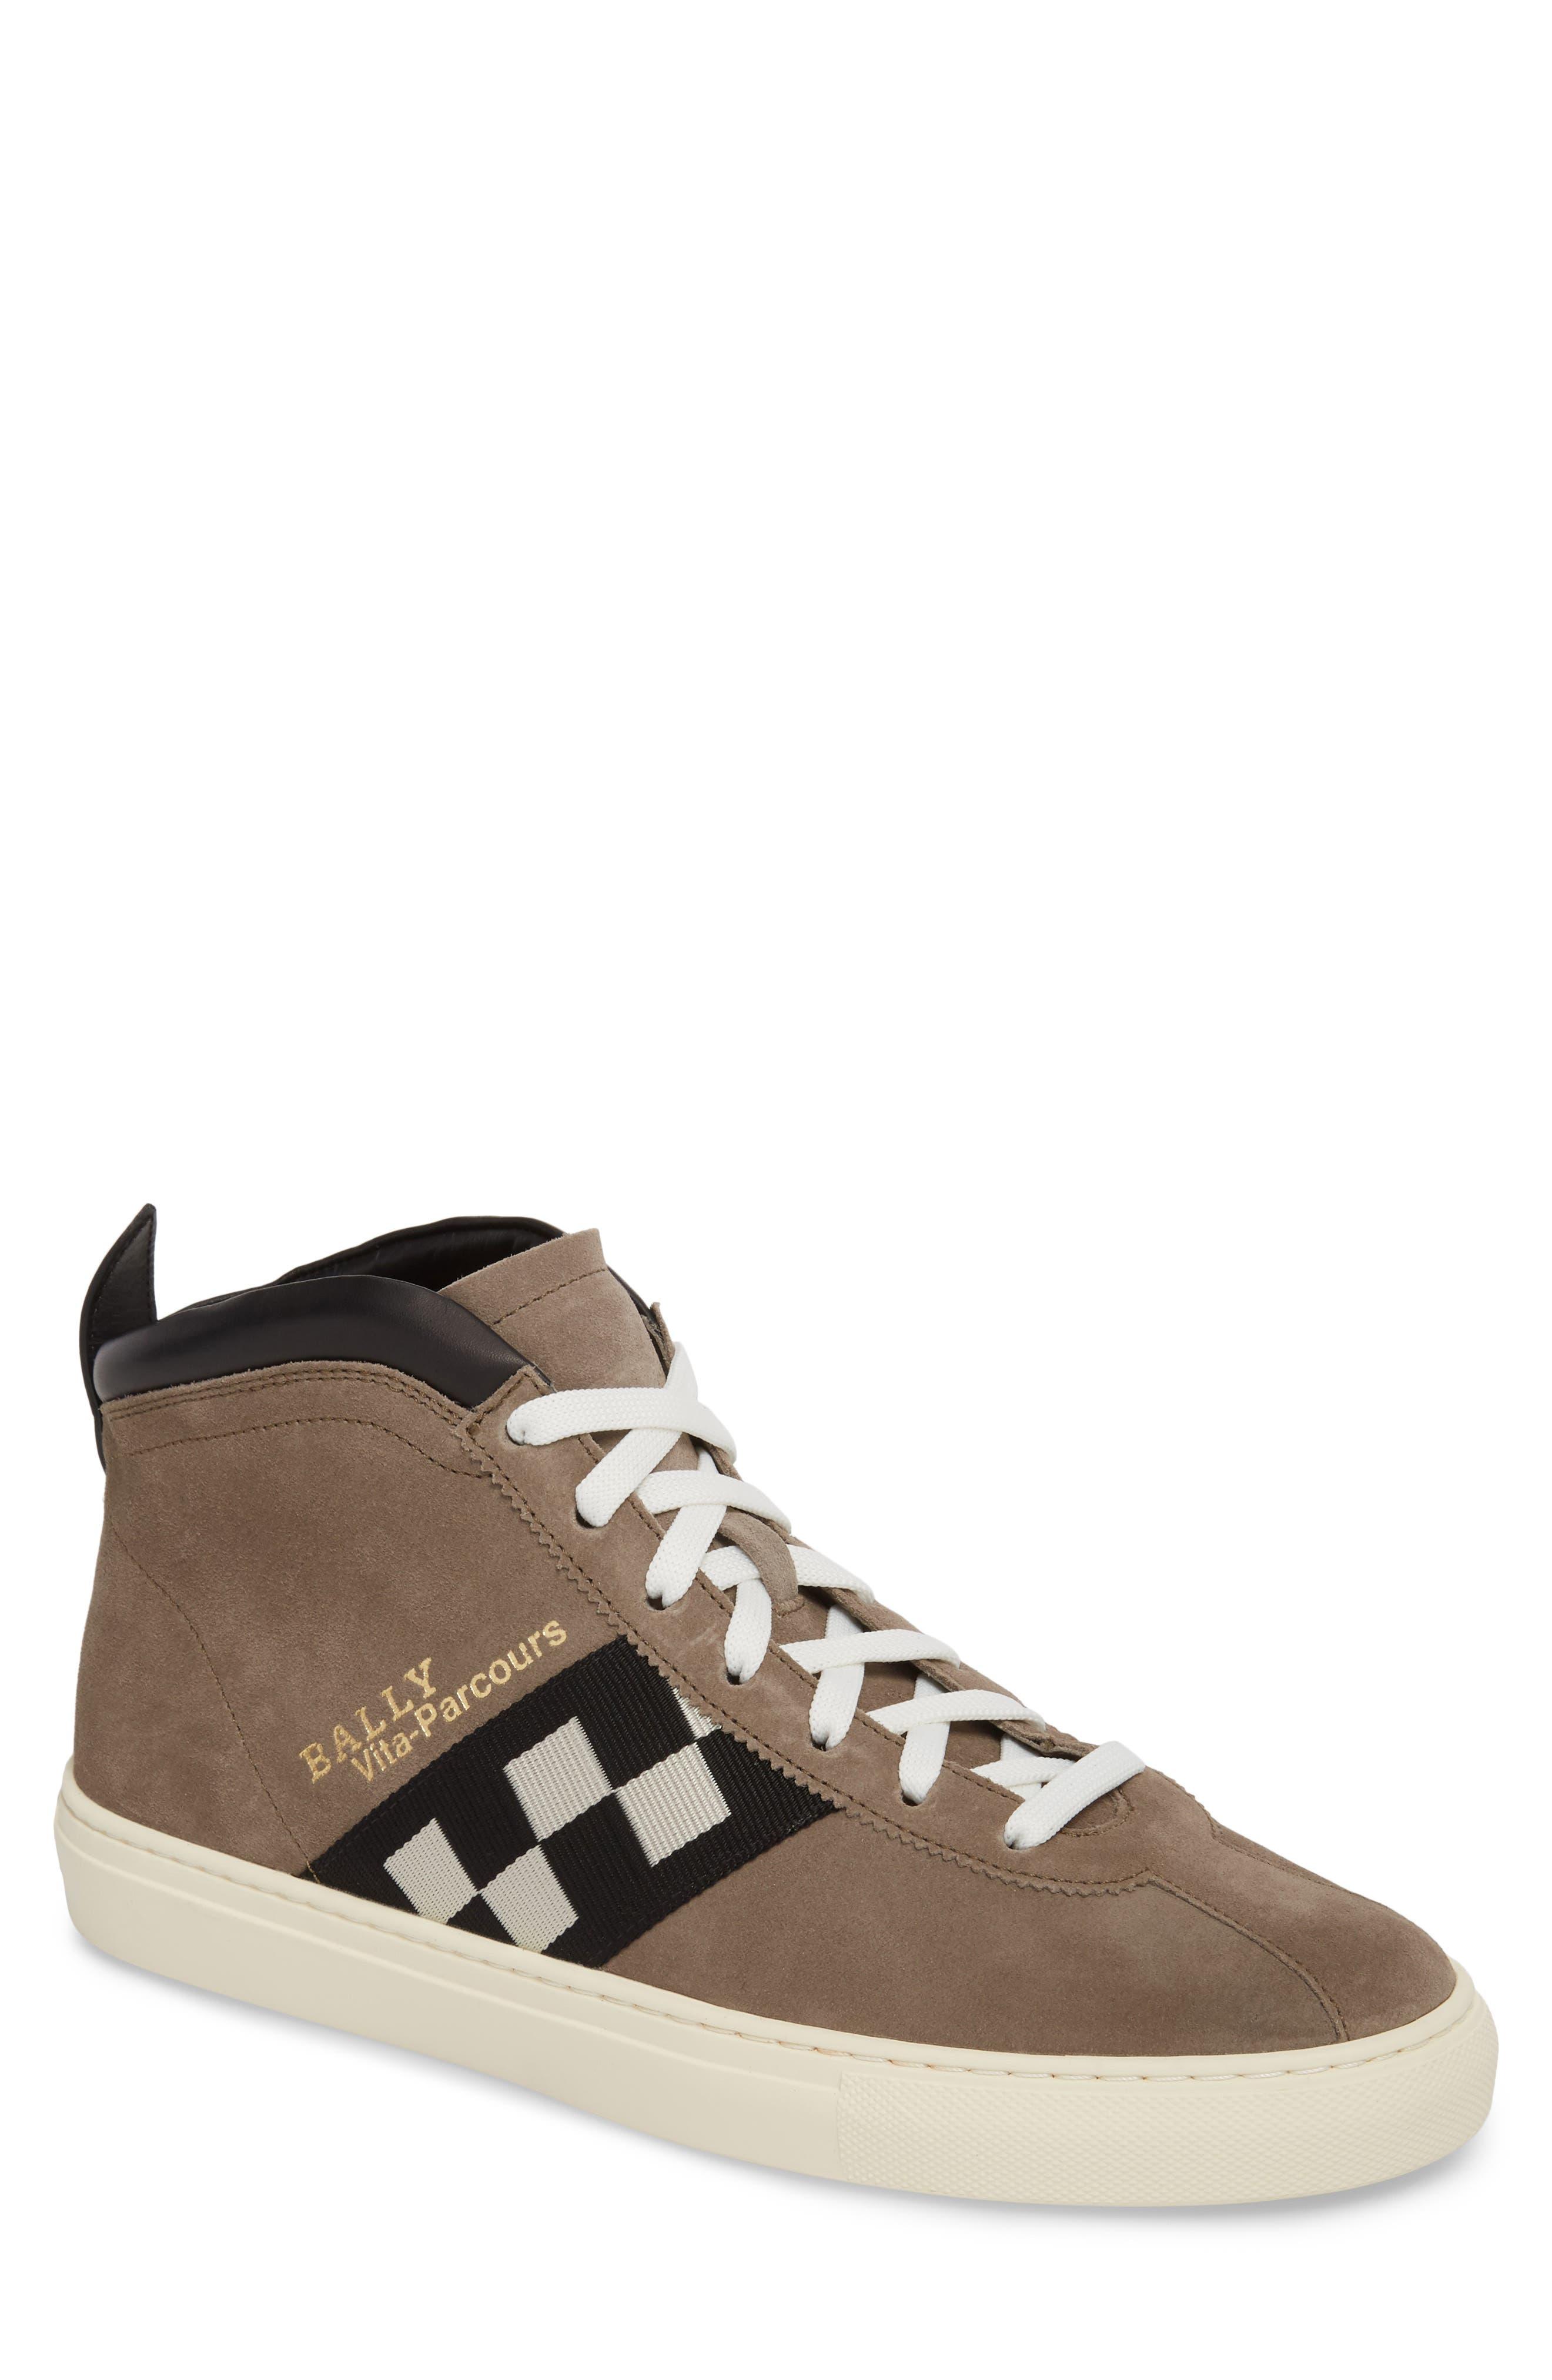 Vita Checkered High Top Sneaker,                         Main,                         color, Snuff